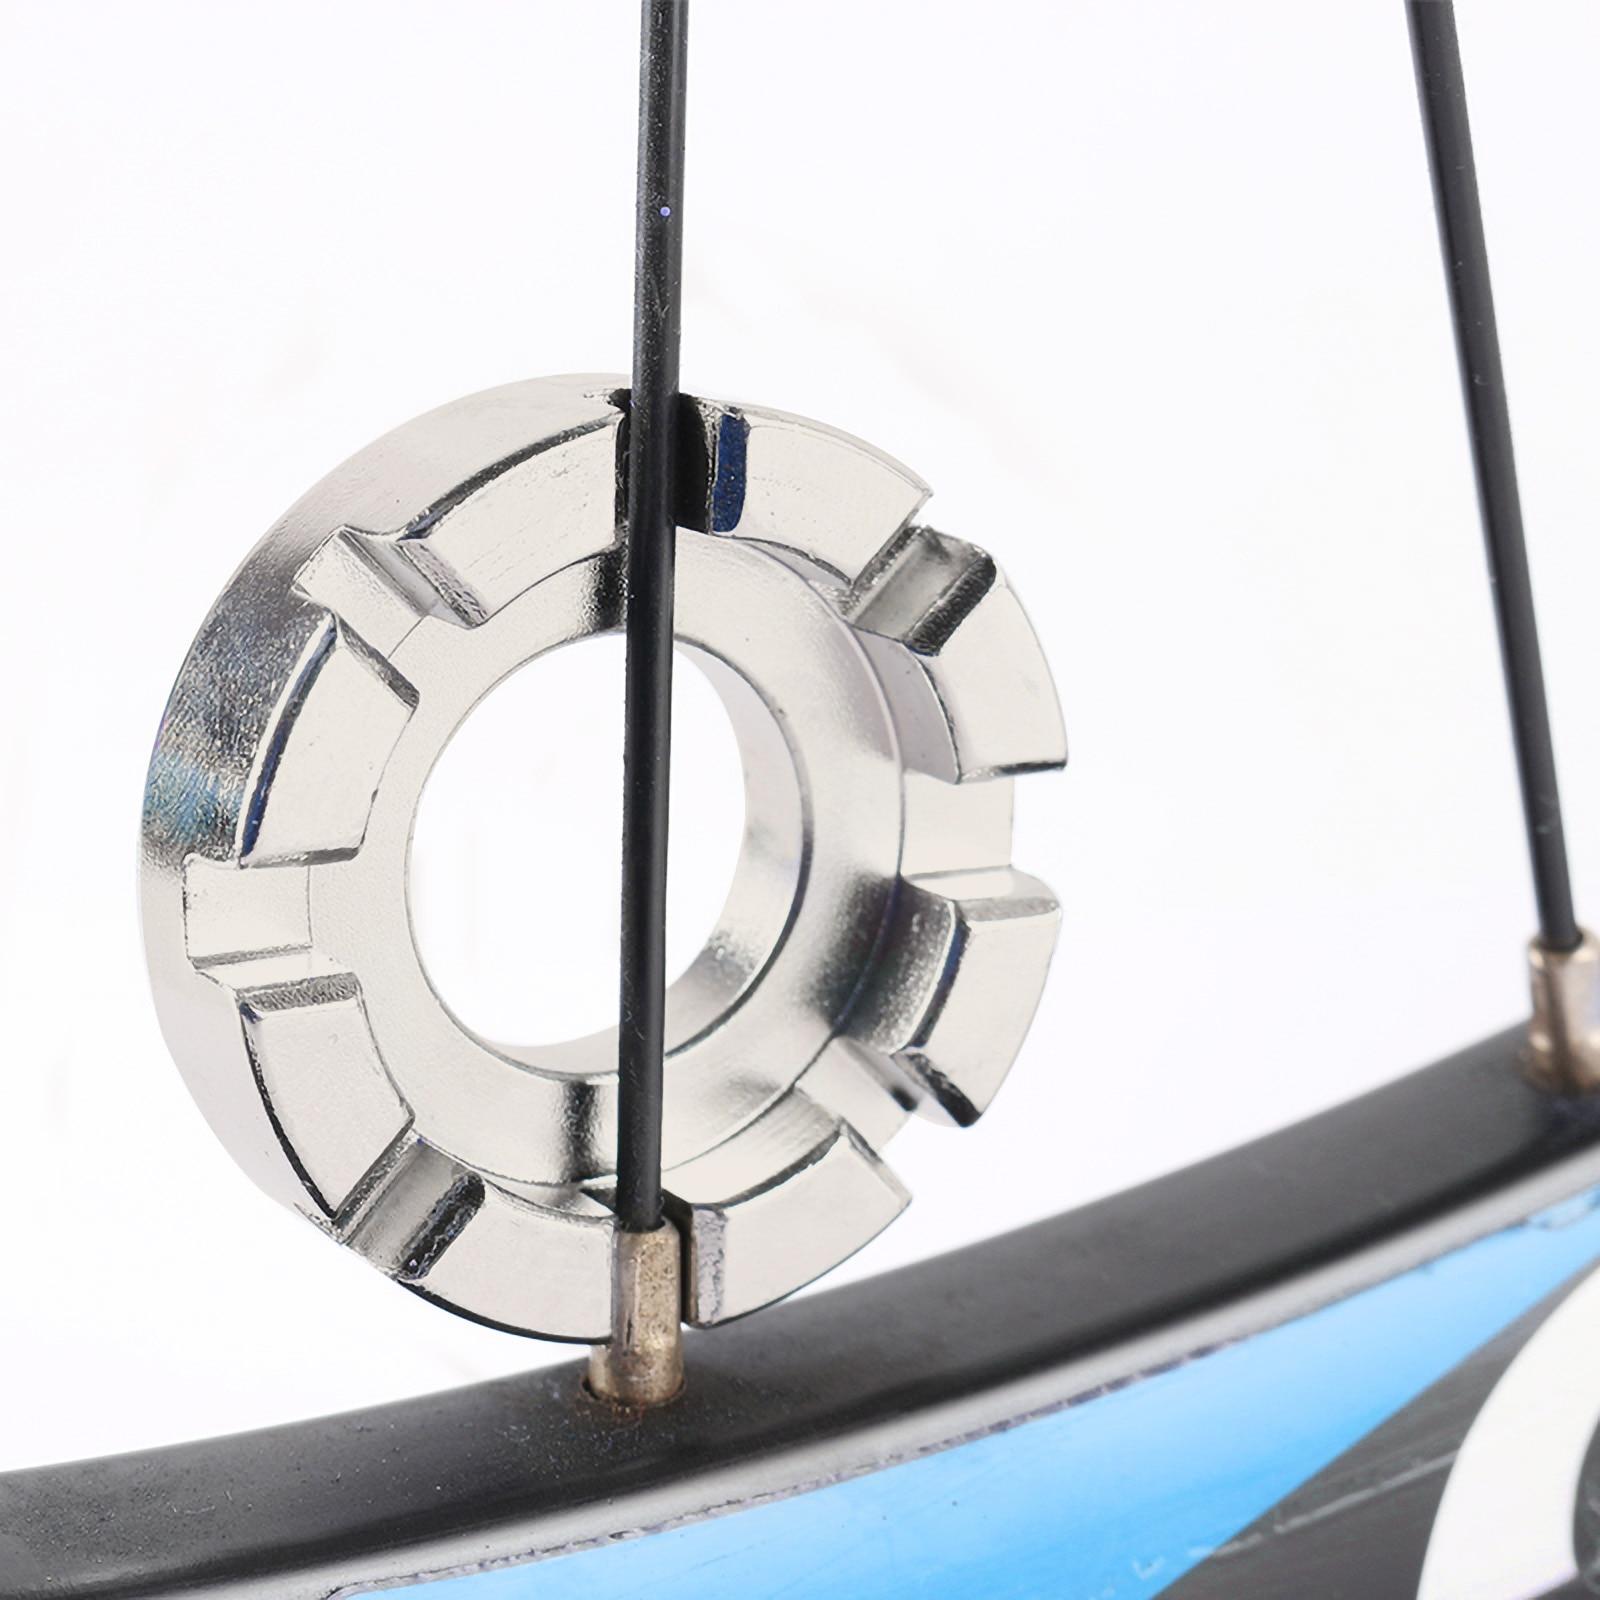 1PCS Bicycle Spoke Nipple Wrench Bike 8 Way Spoke Nipple Key Wheel Rim Wrench Stainless Steel Repair Tool Key Bicycle Accessory